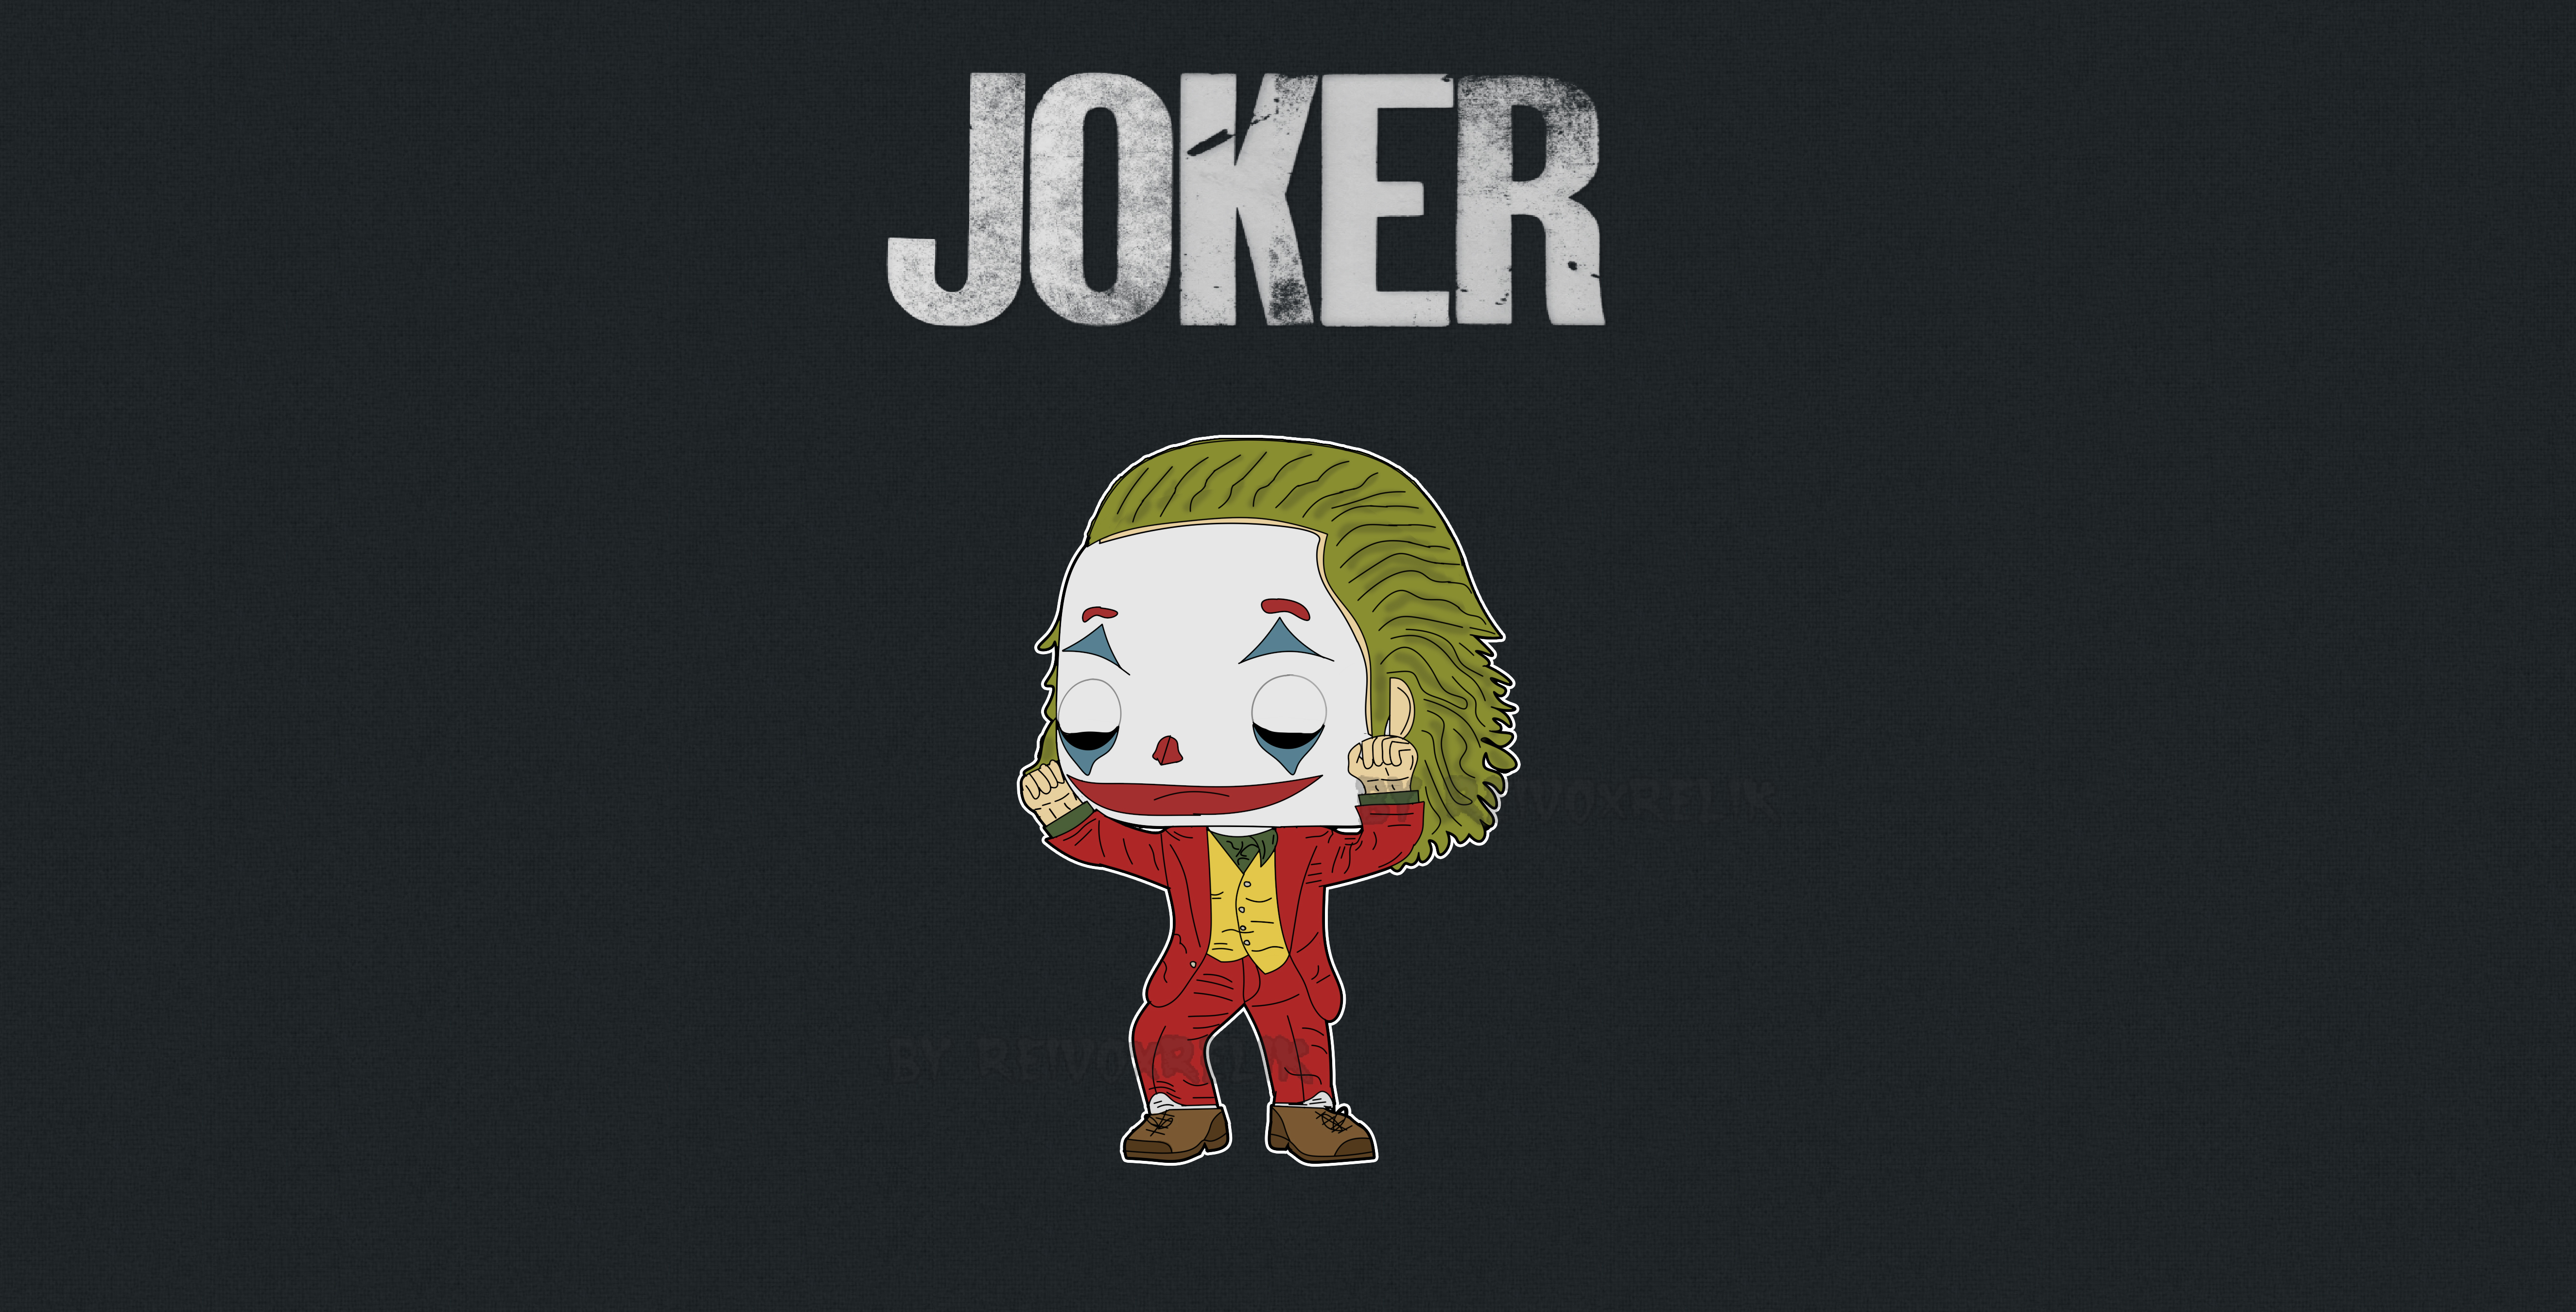 1920x1080 Joker Cartoon Art 1080P Laptop Full HD Wallpaper ...